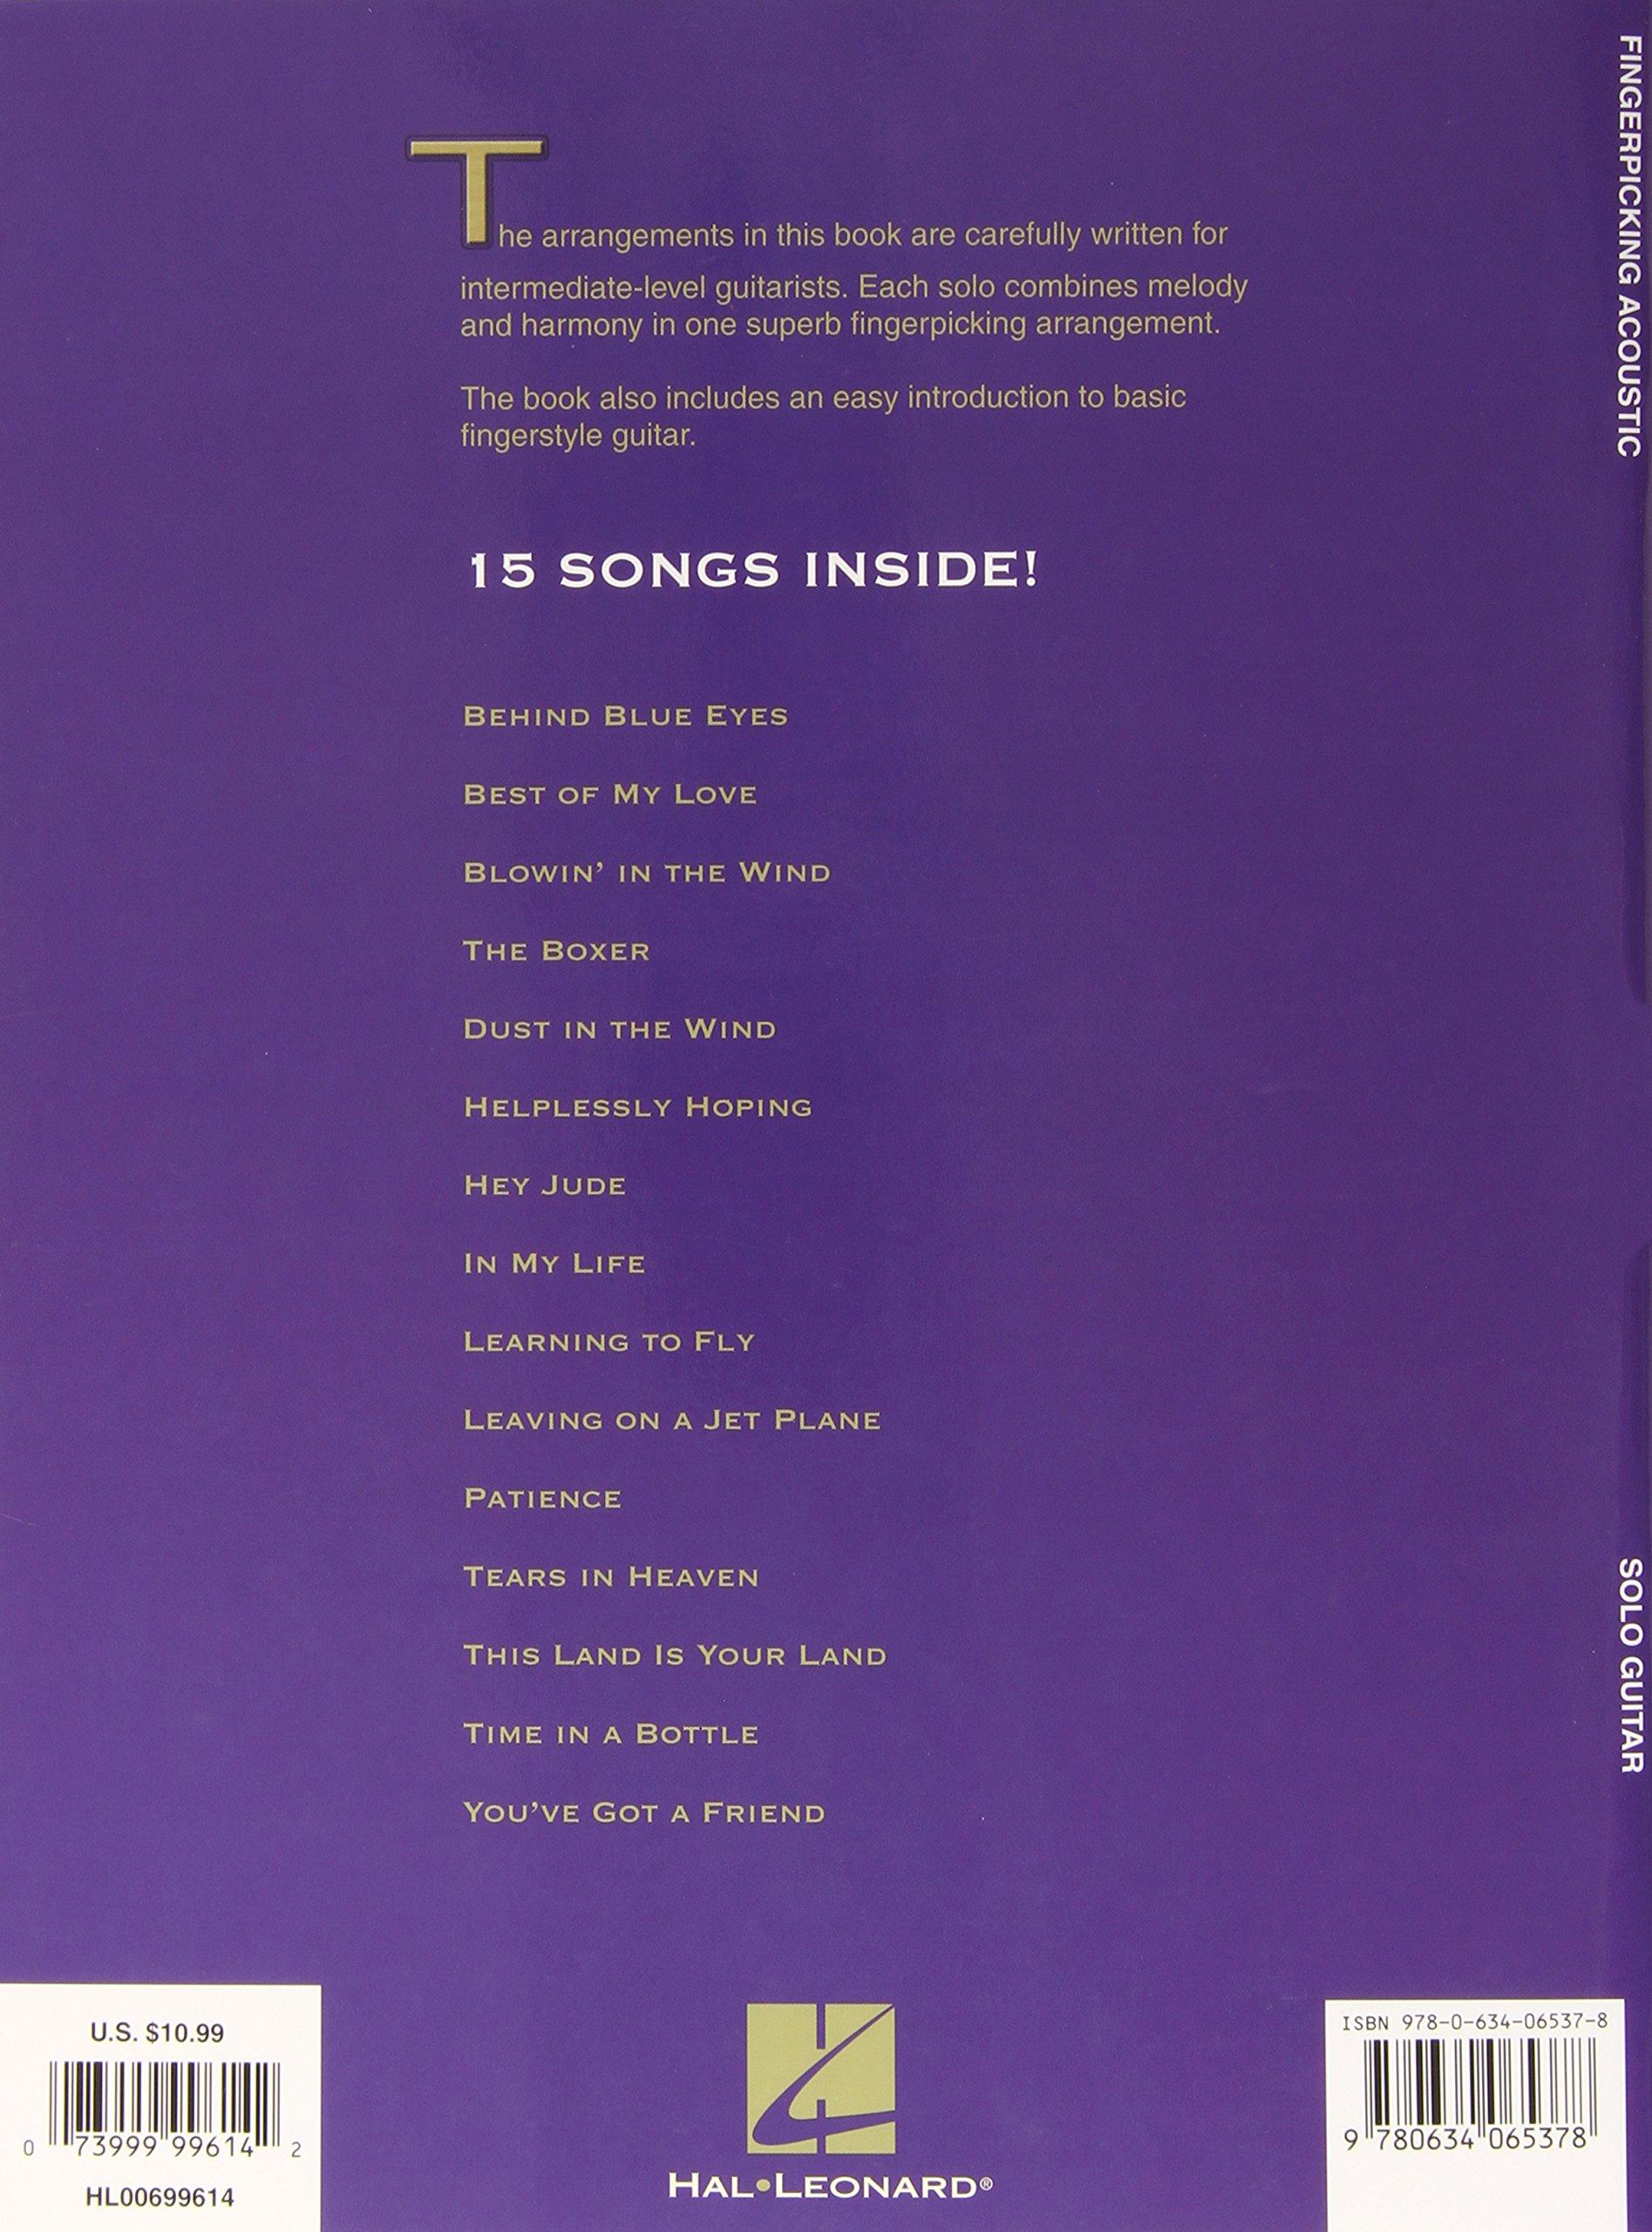 Amazon Fingerpicking Acoustic 15 Songs Arranged For Solo